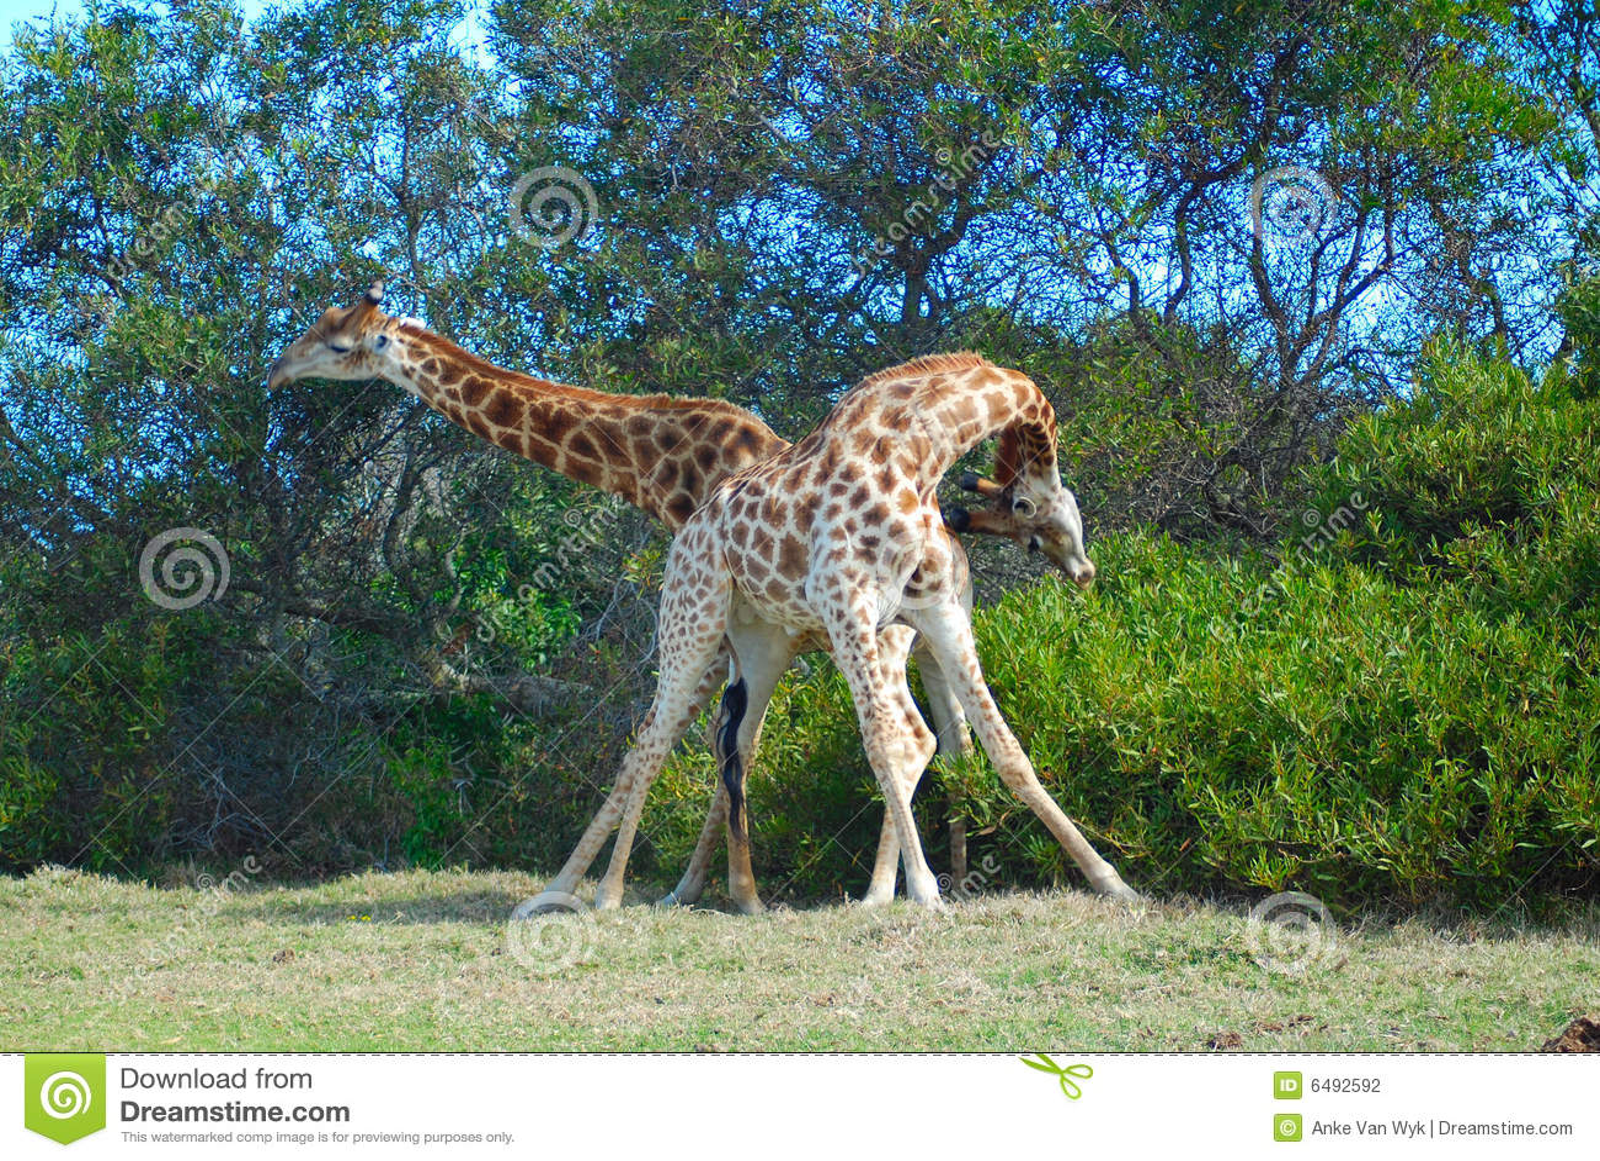 Giraffe bulls fighting